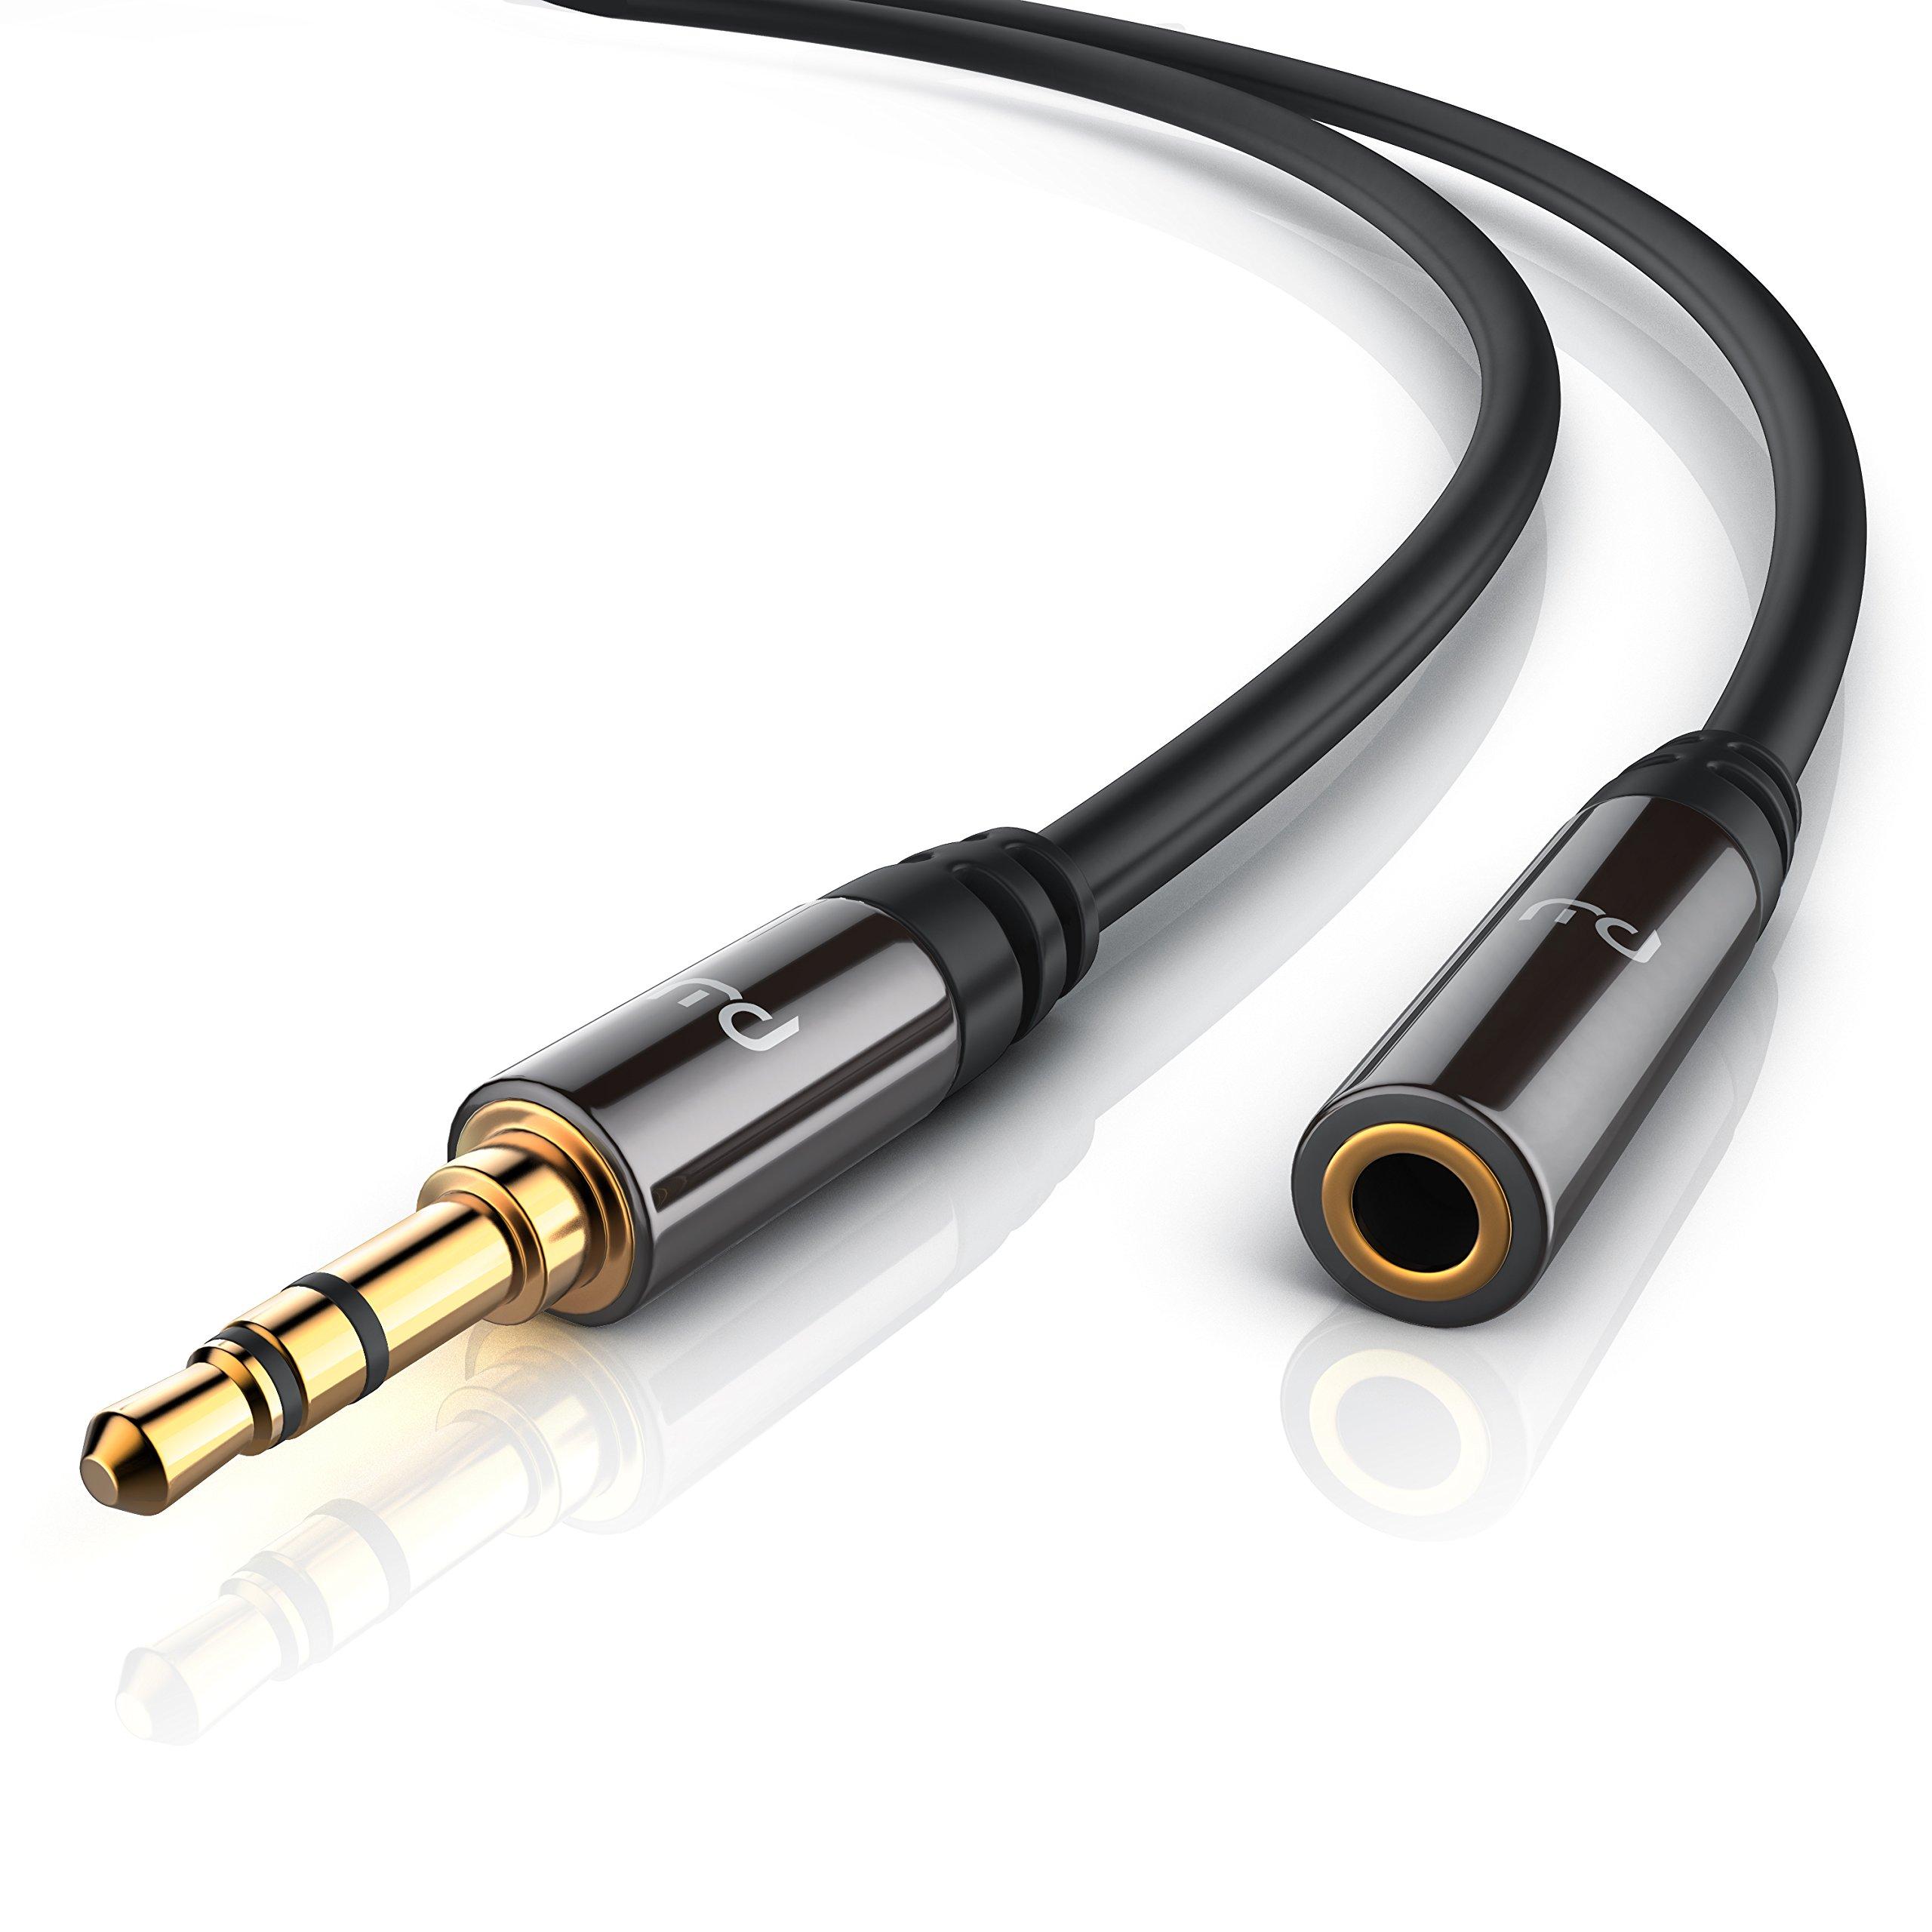 Primewire - 20m Cable Auxiliar de Audio/Cable alargador 3.5mm Jack para entradas AUX